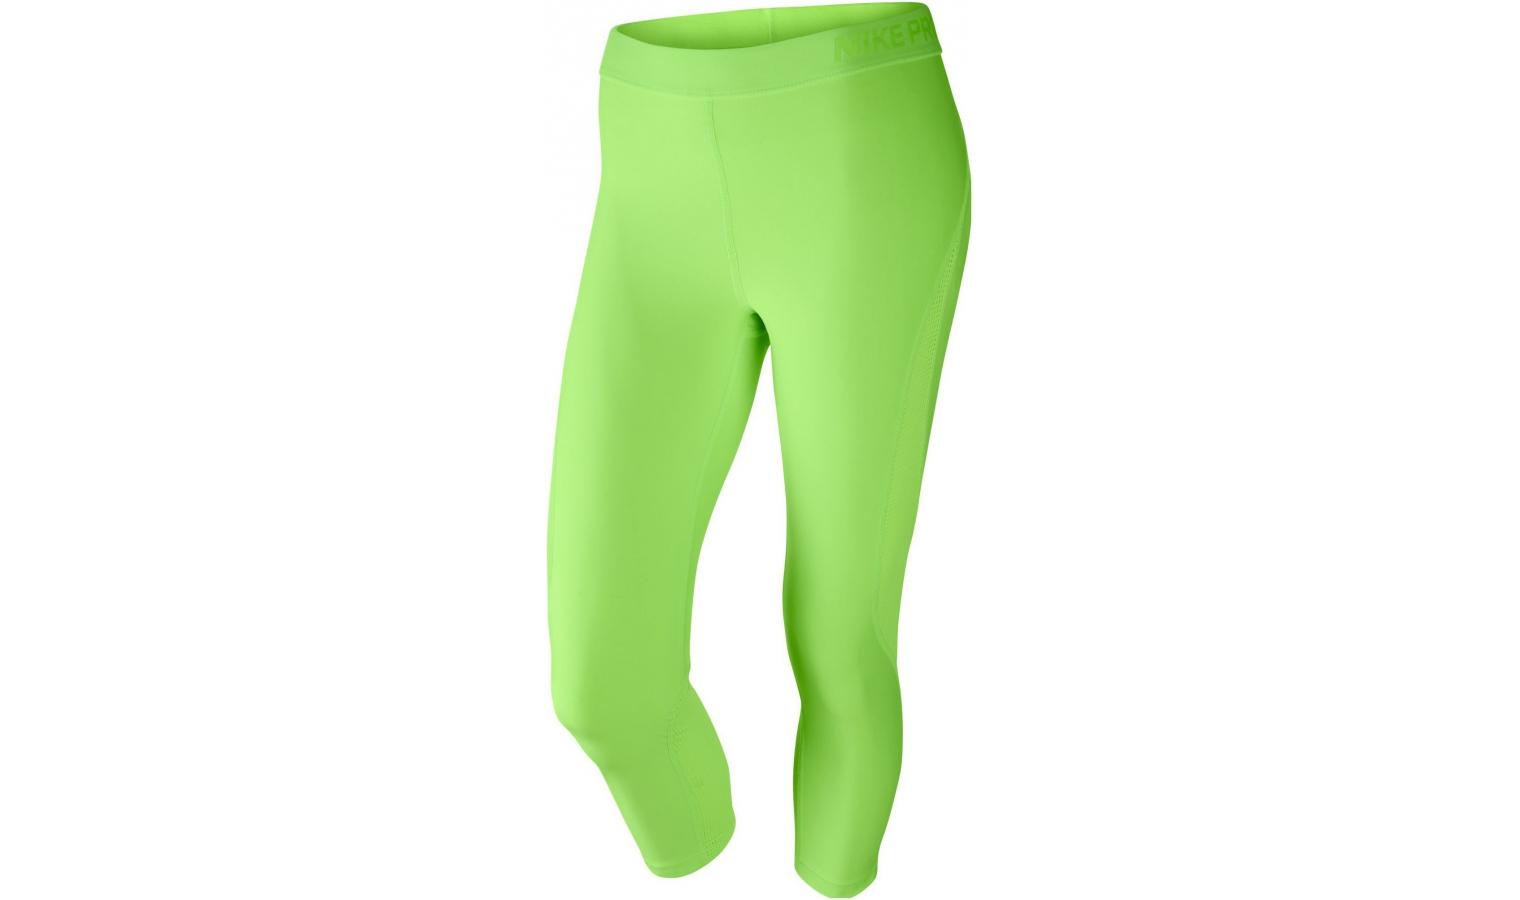 ... Dámské sportovní legíny Nike W NP HYPERCOOL CAPRI SUMM WASH W zelené.  Sleva 6721bc8e62